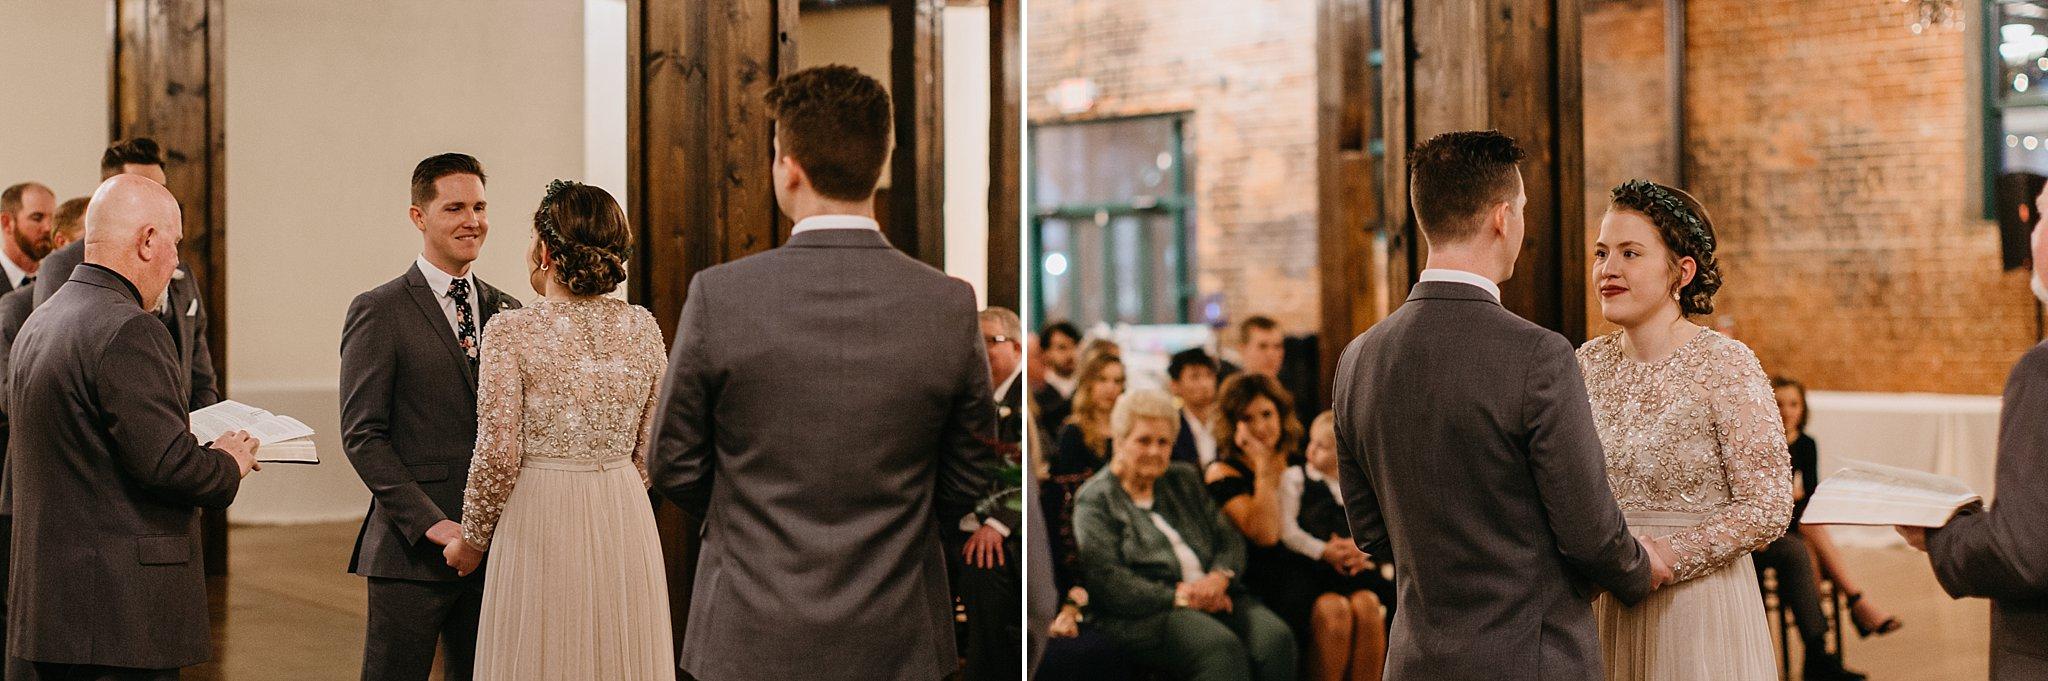 Wilderlove Co_Waco Texas_The Phoenix_Romantic Wedding Photography_0075.jpg